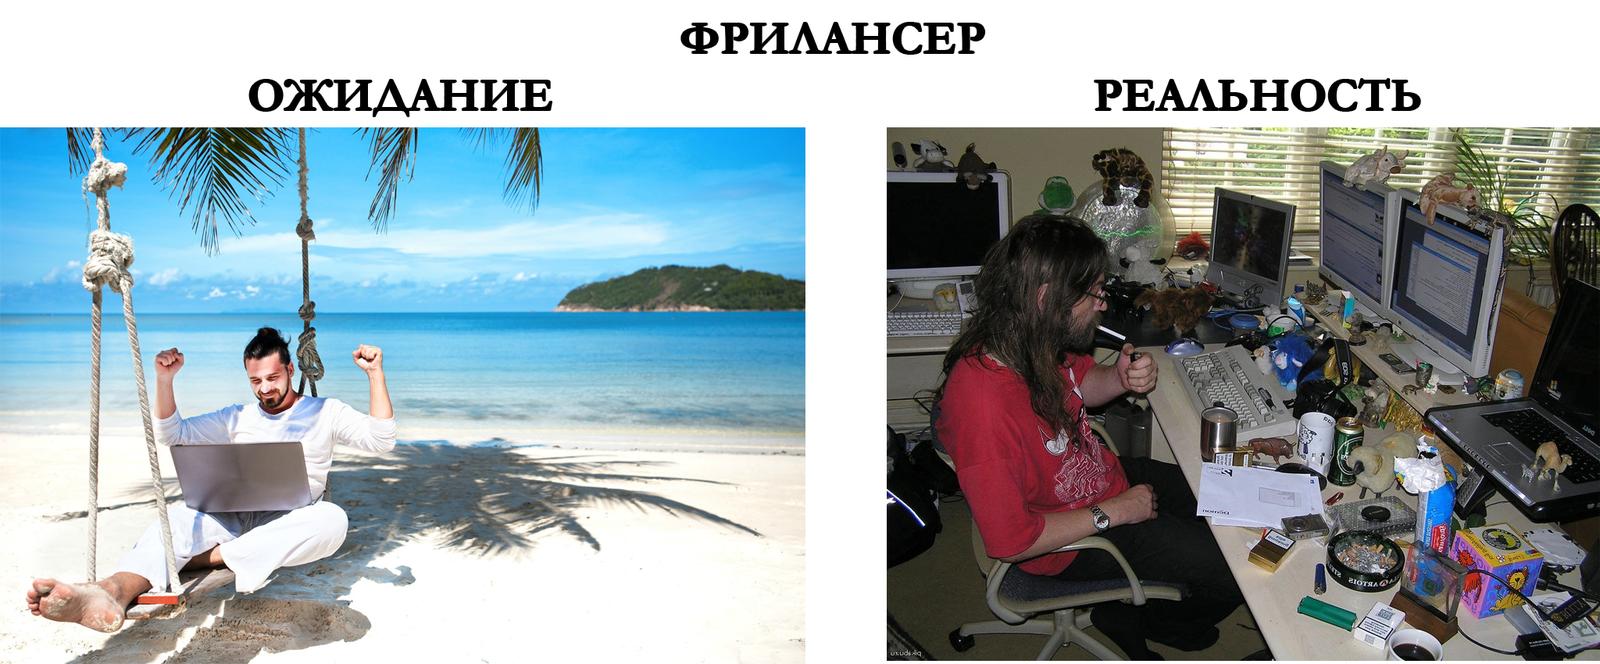 https://cs7.pikabu.ru/post_img/big/2018/02/21/9/1519227143181073842.jpg